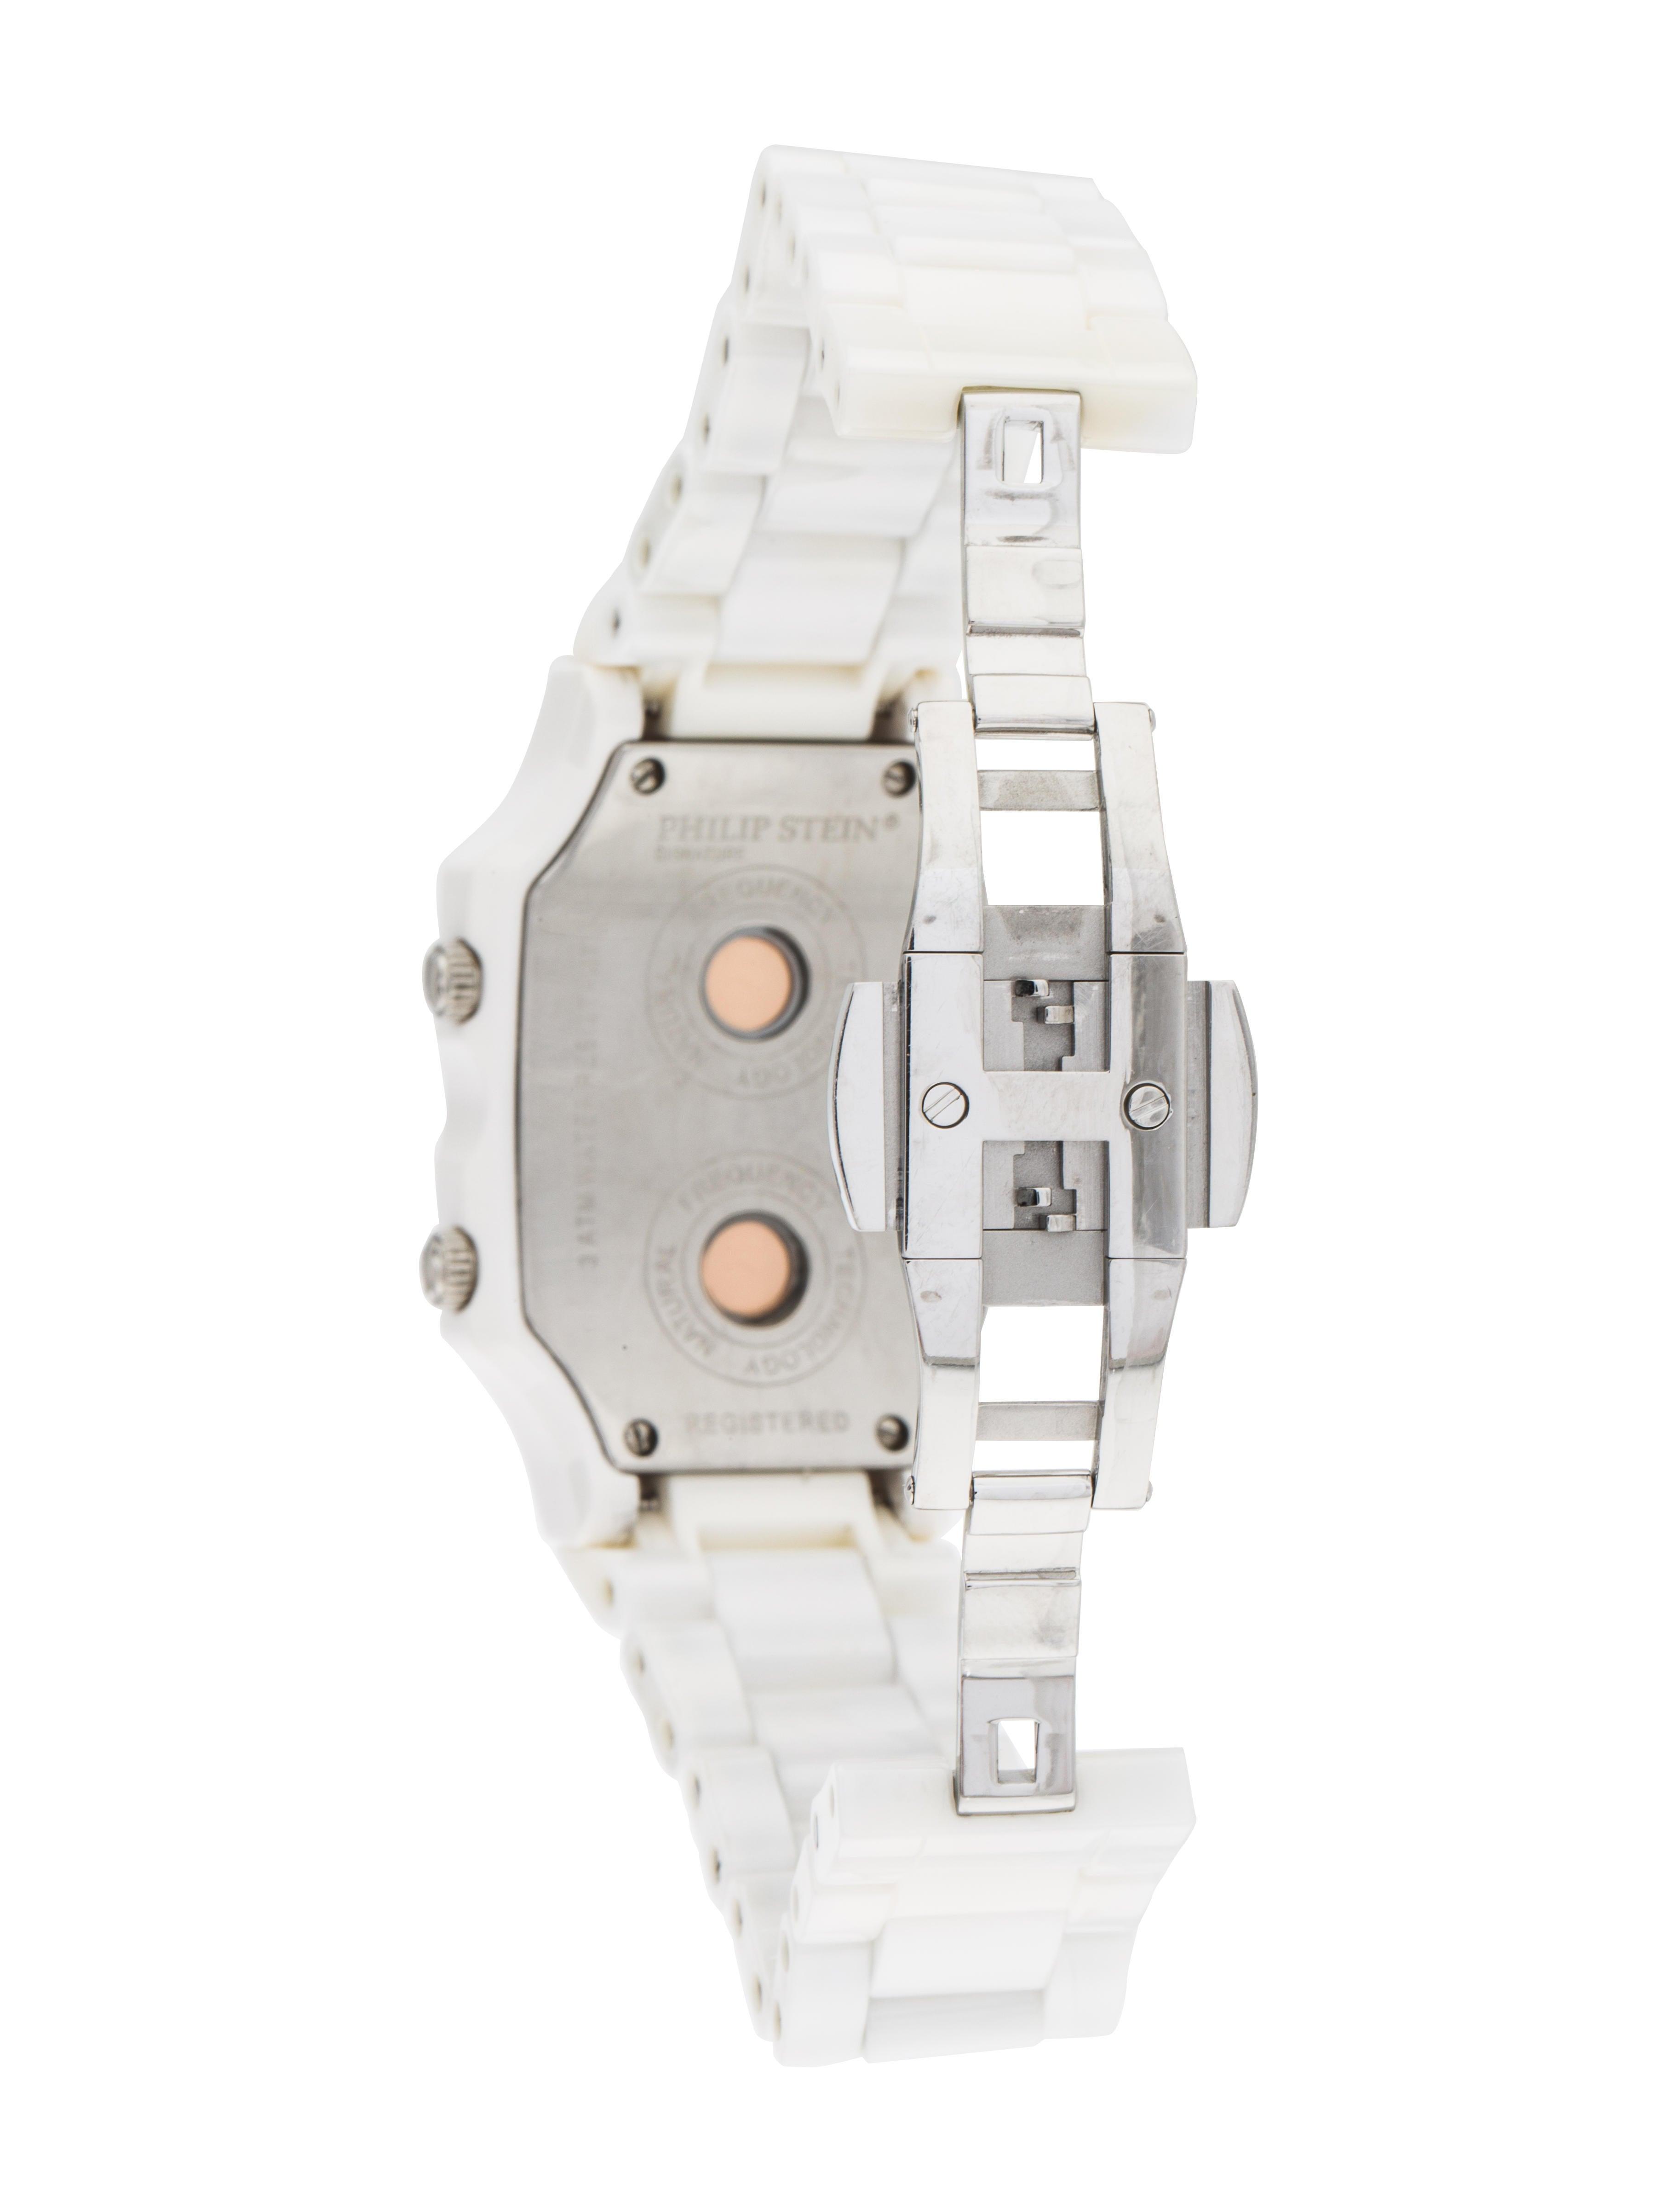 Philip Stein Teslar Watch Bracelet Phs20672 The Realreal